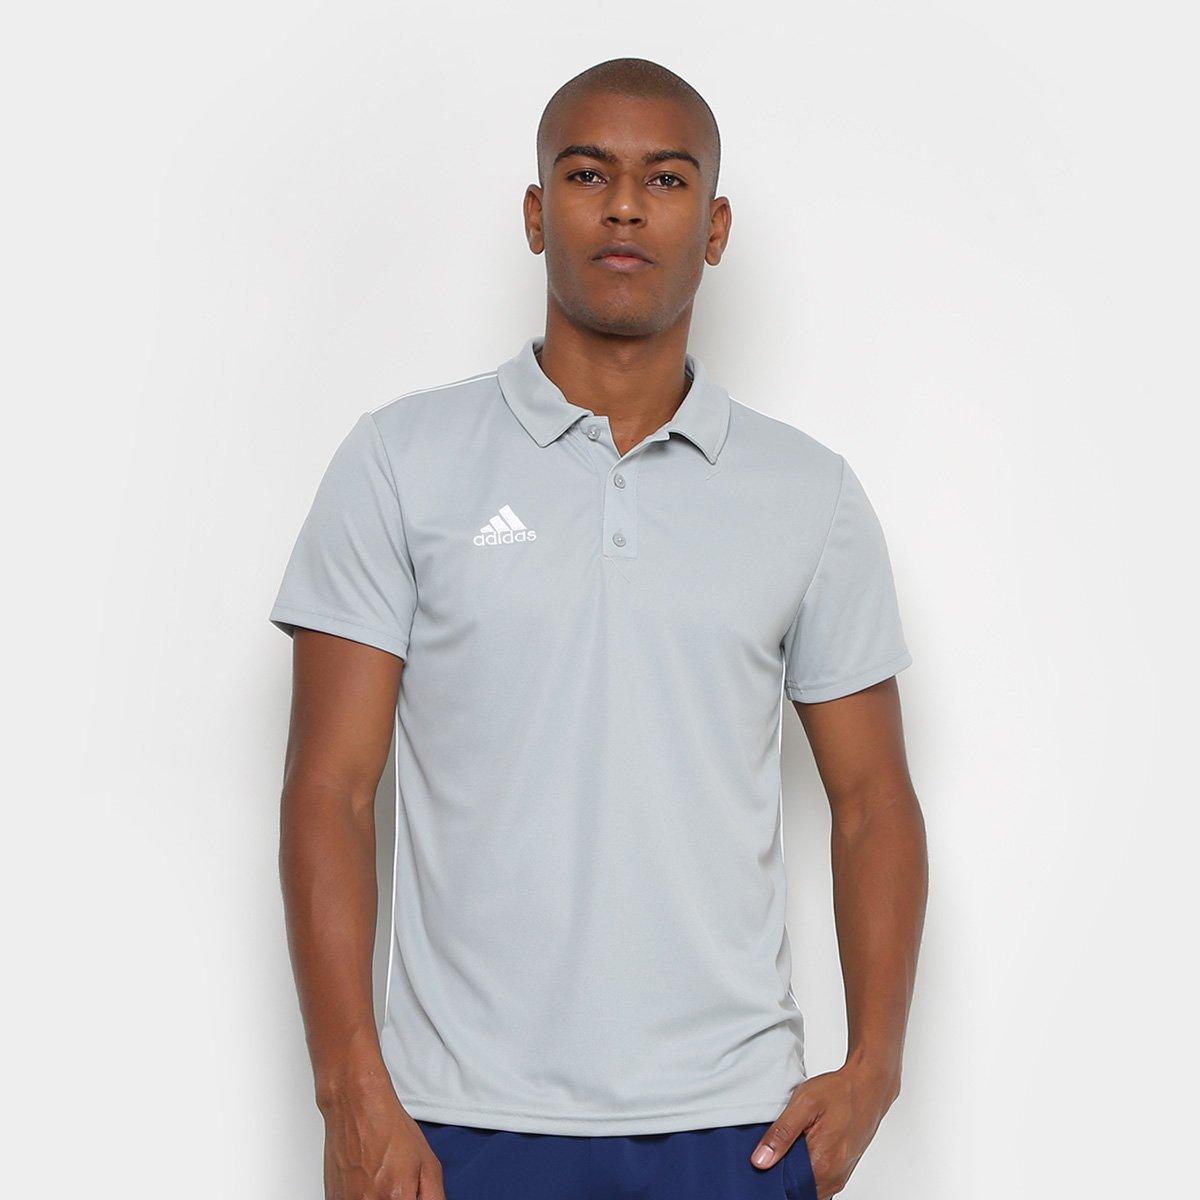 Camisa Polo Adidas Core 18 Masculina - Compre Agora  1f3eaa9976e